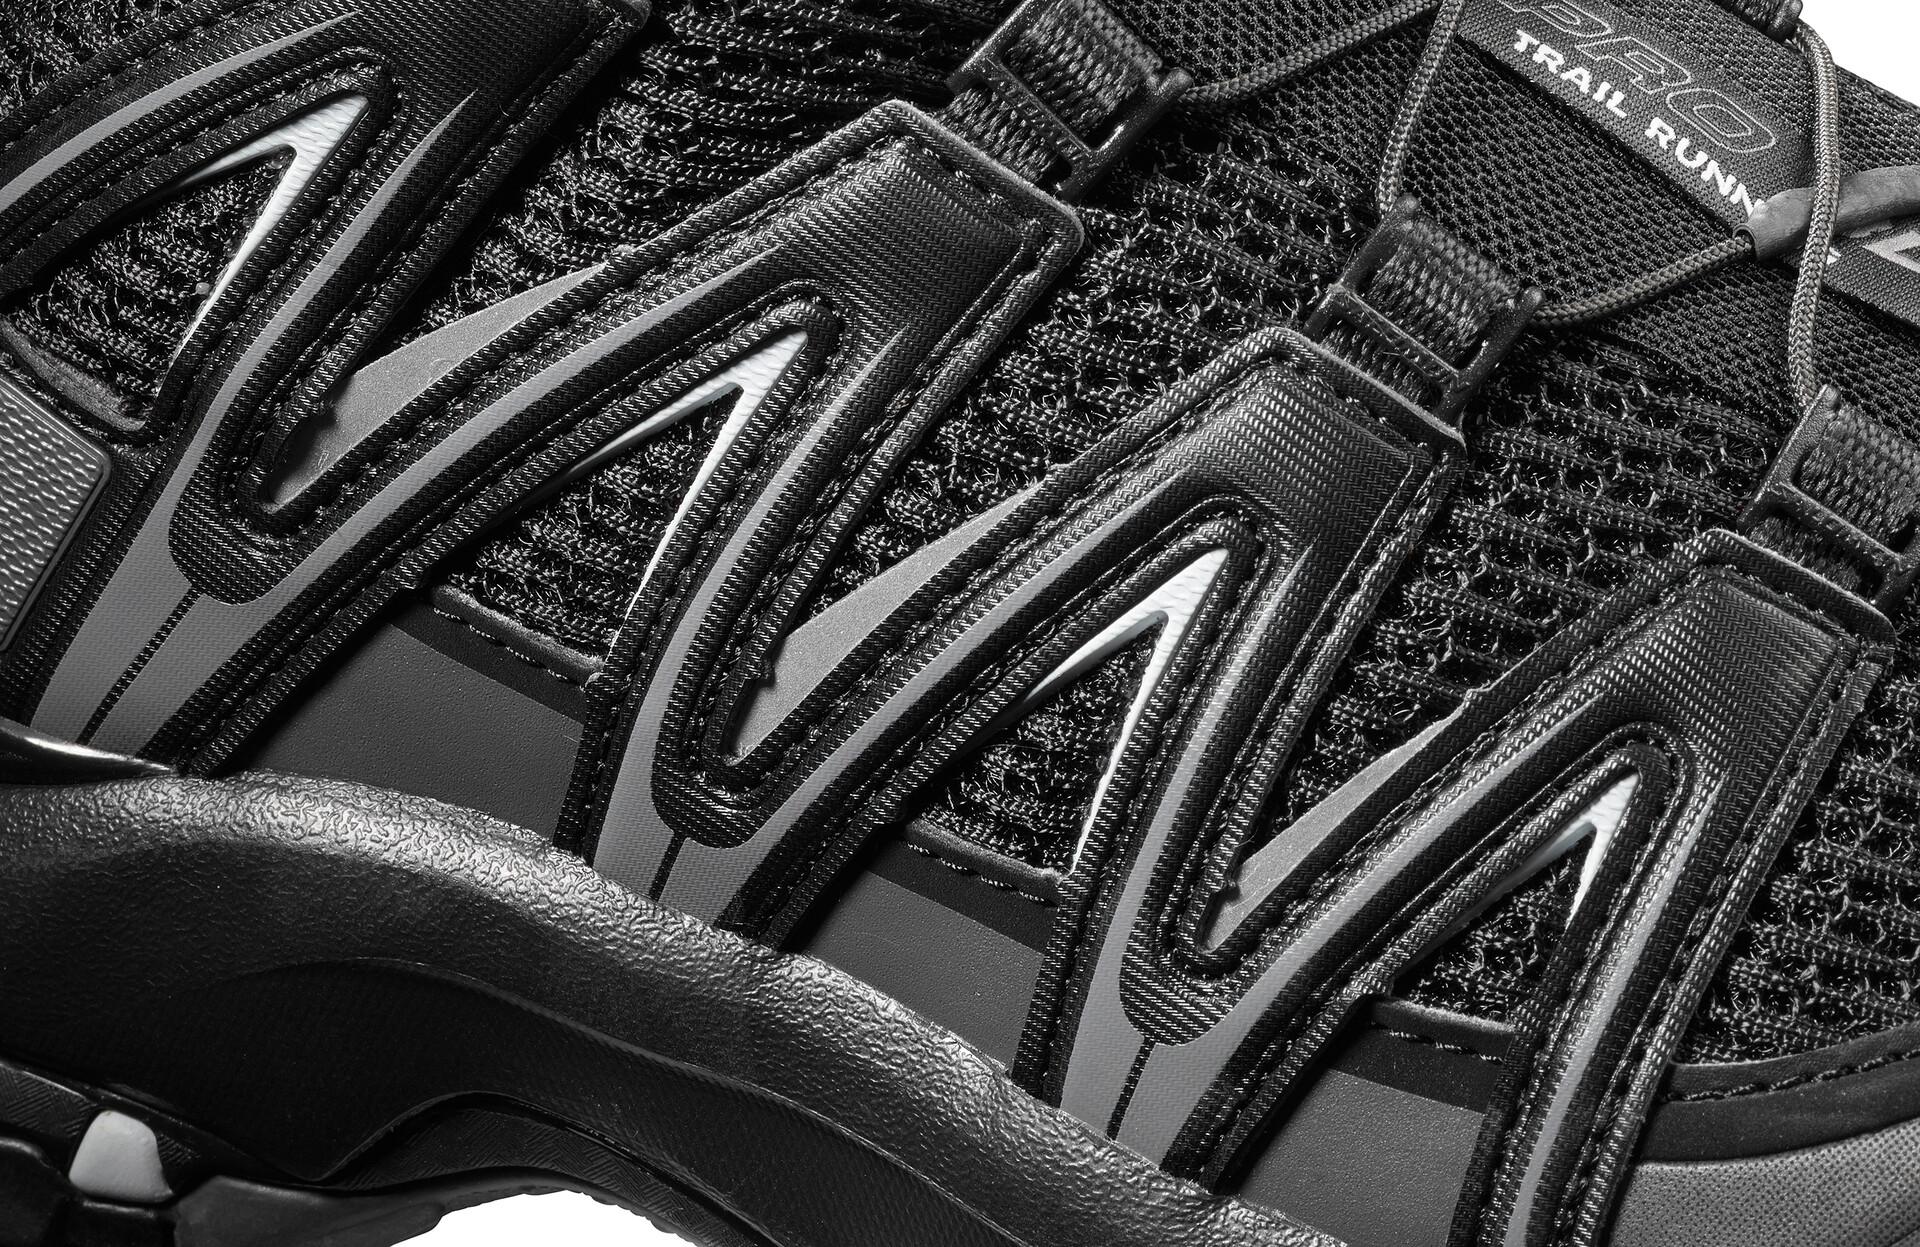 Salomon XA Pro 3D GTX sko, blackblackmagnetite 45 13 UK 10,5